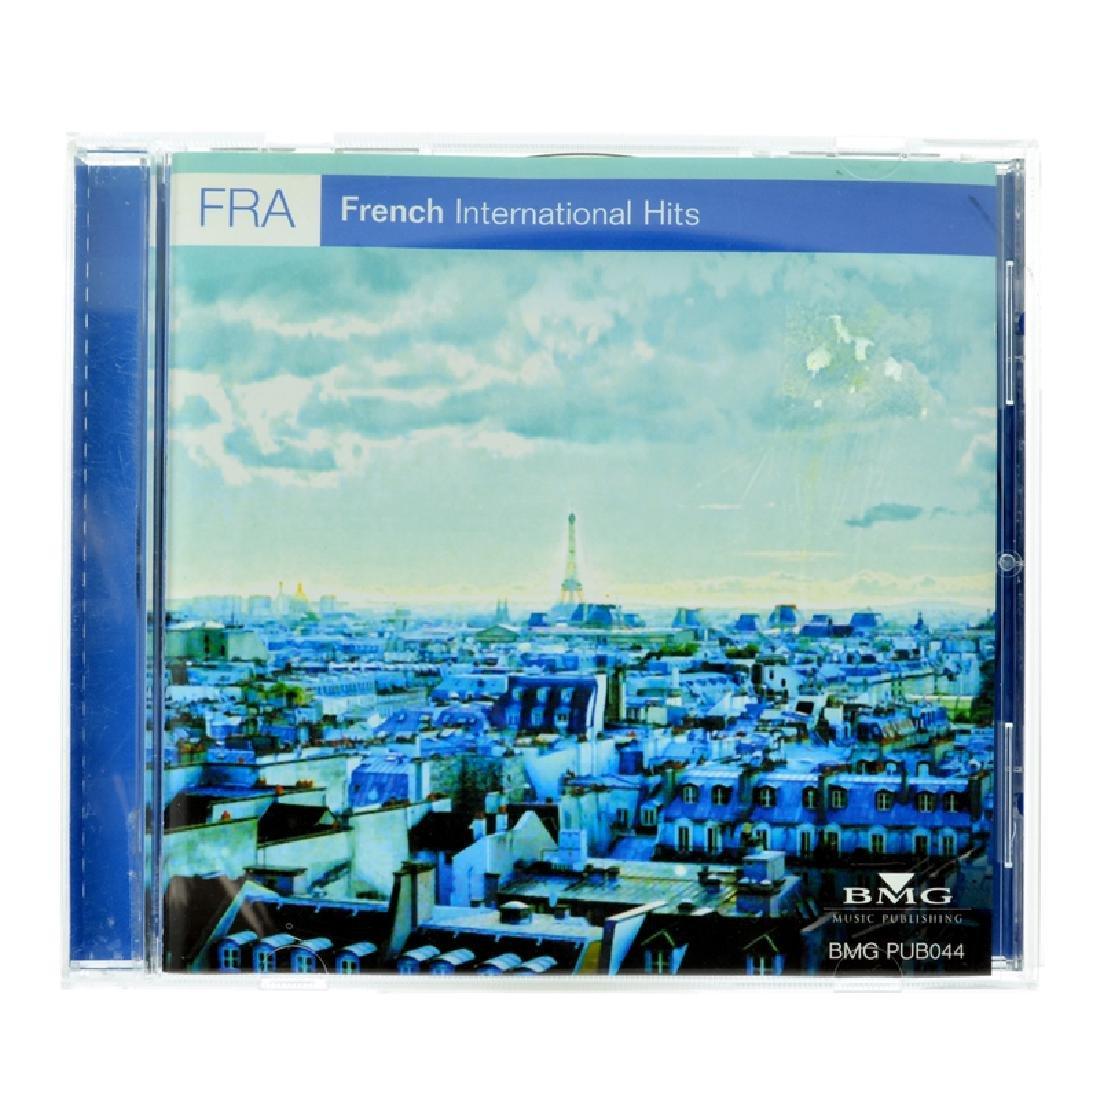 FRA French International Hits CDs